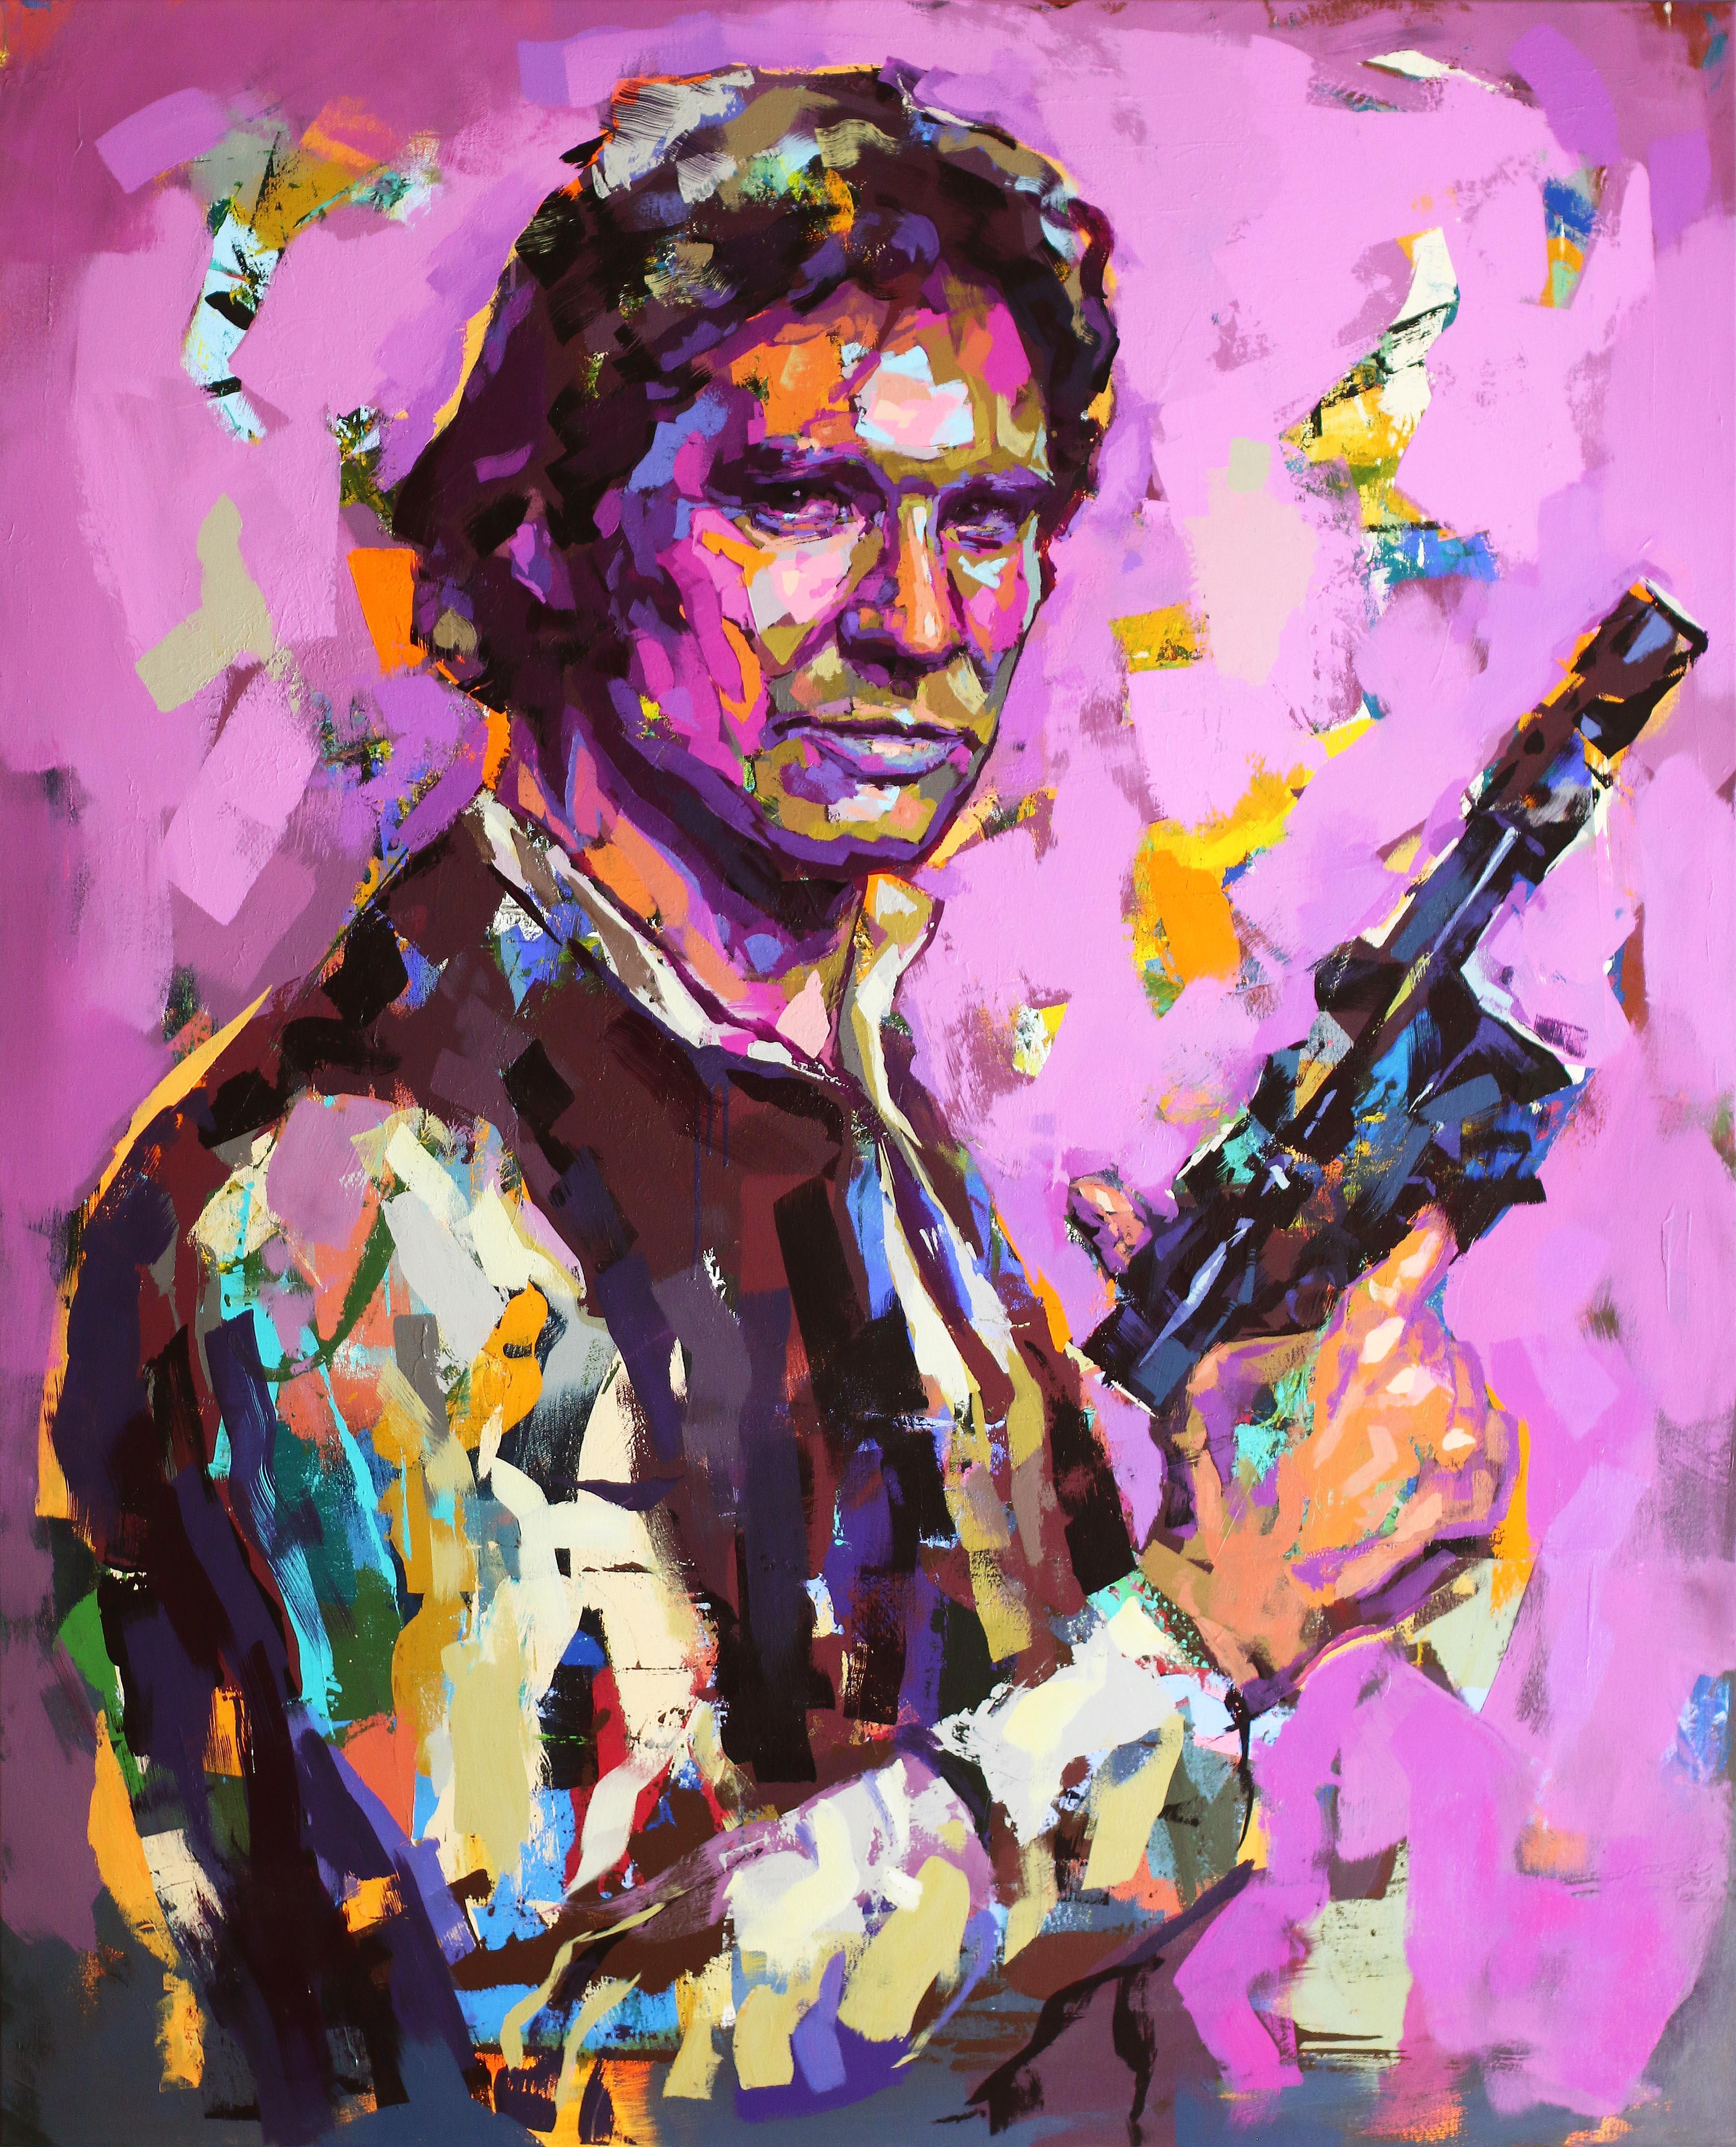 """Han Solo/Star Wars"" Akryl av Alberto Ramirez LEG. 160x130 cm"